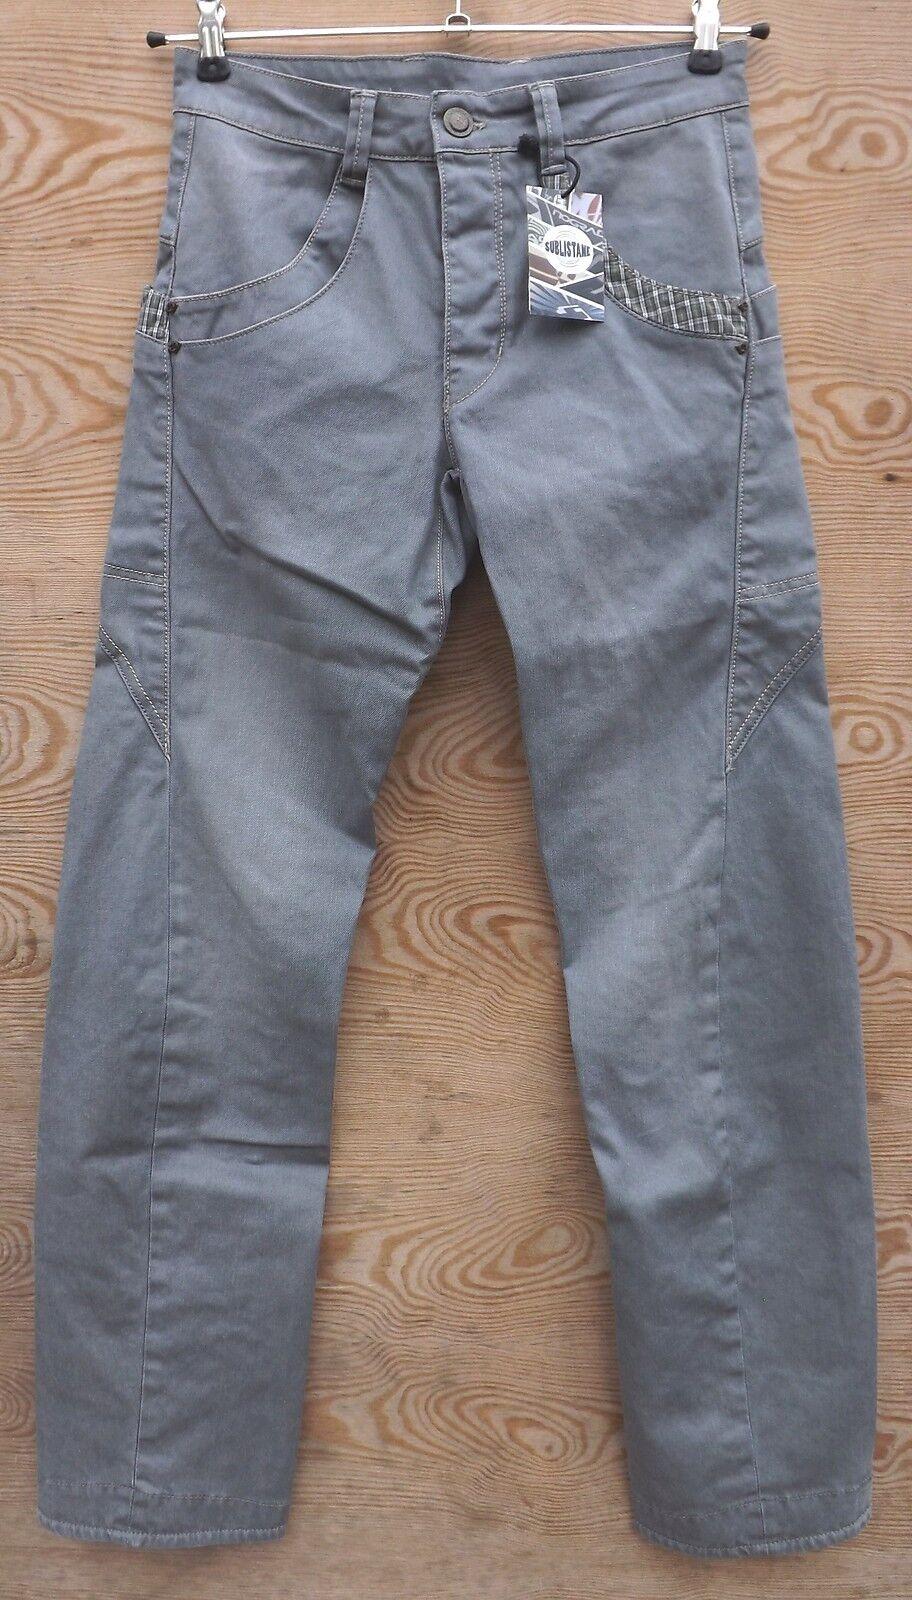 Nograd Jeans Jeans Nograd Tornado Pant Men, Gr. XXL, Grau scottish 61ecd8